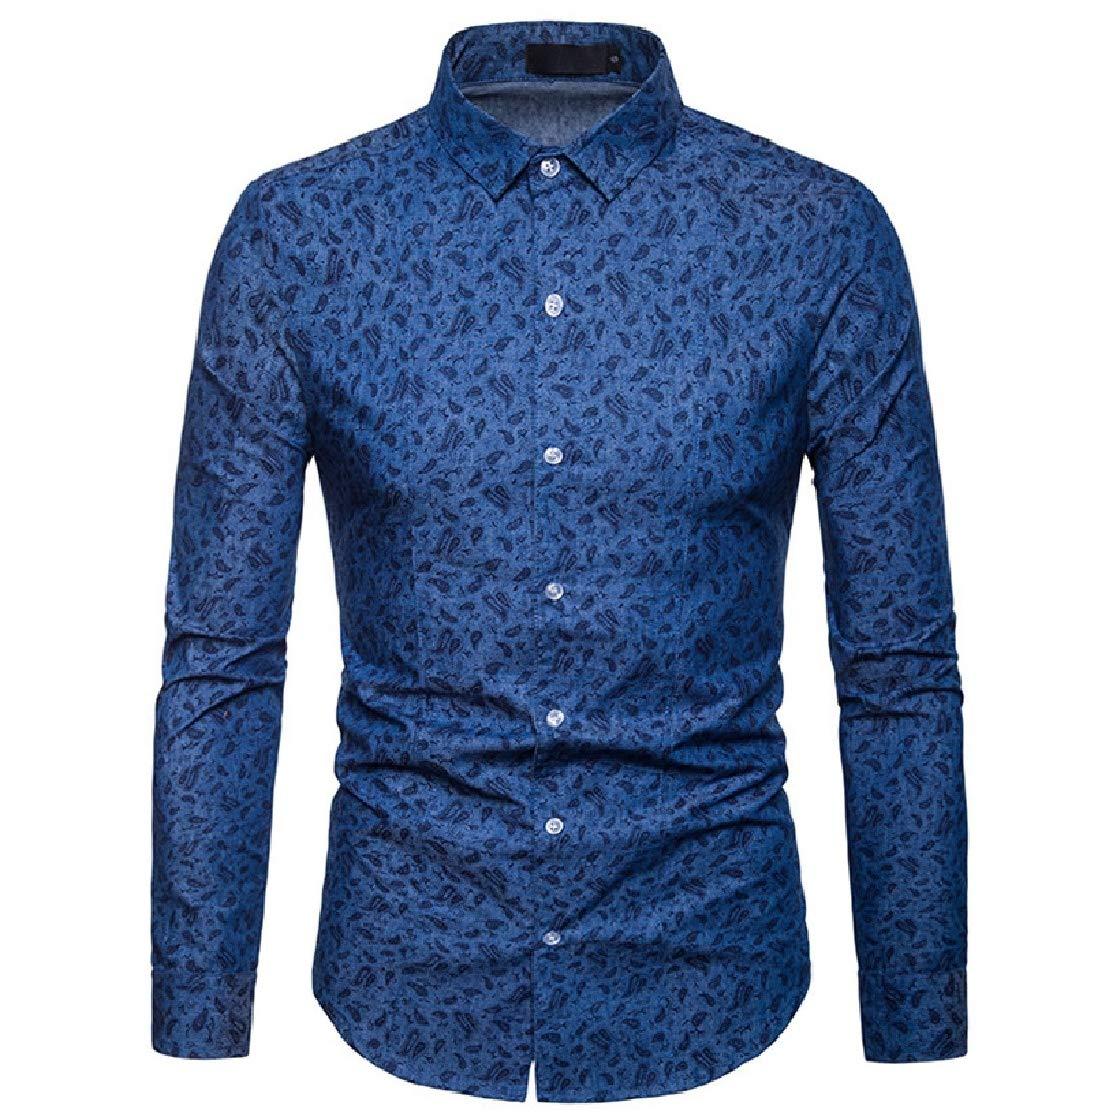 YUNY Mens Floral Long-Sleeve Plus-Size Trim-Fit Casual Autumn Western Shirt Dark Blue L